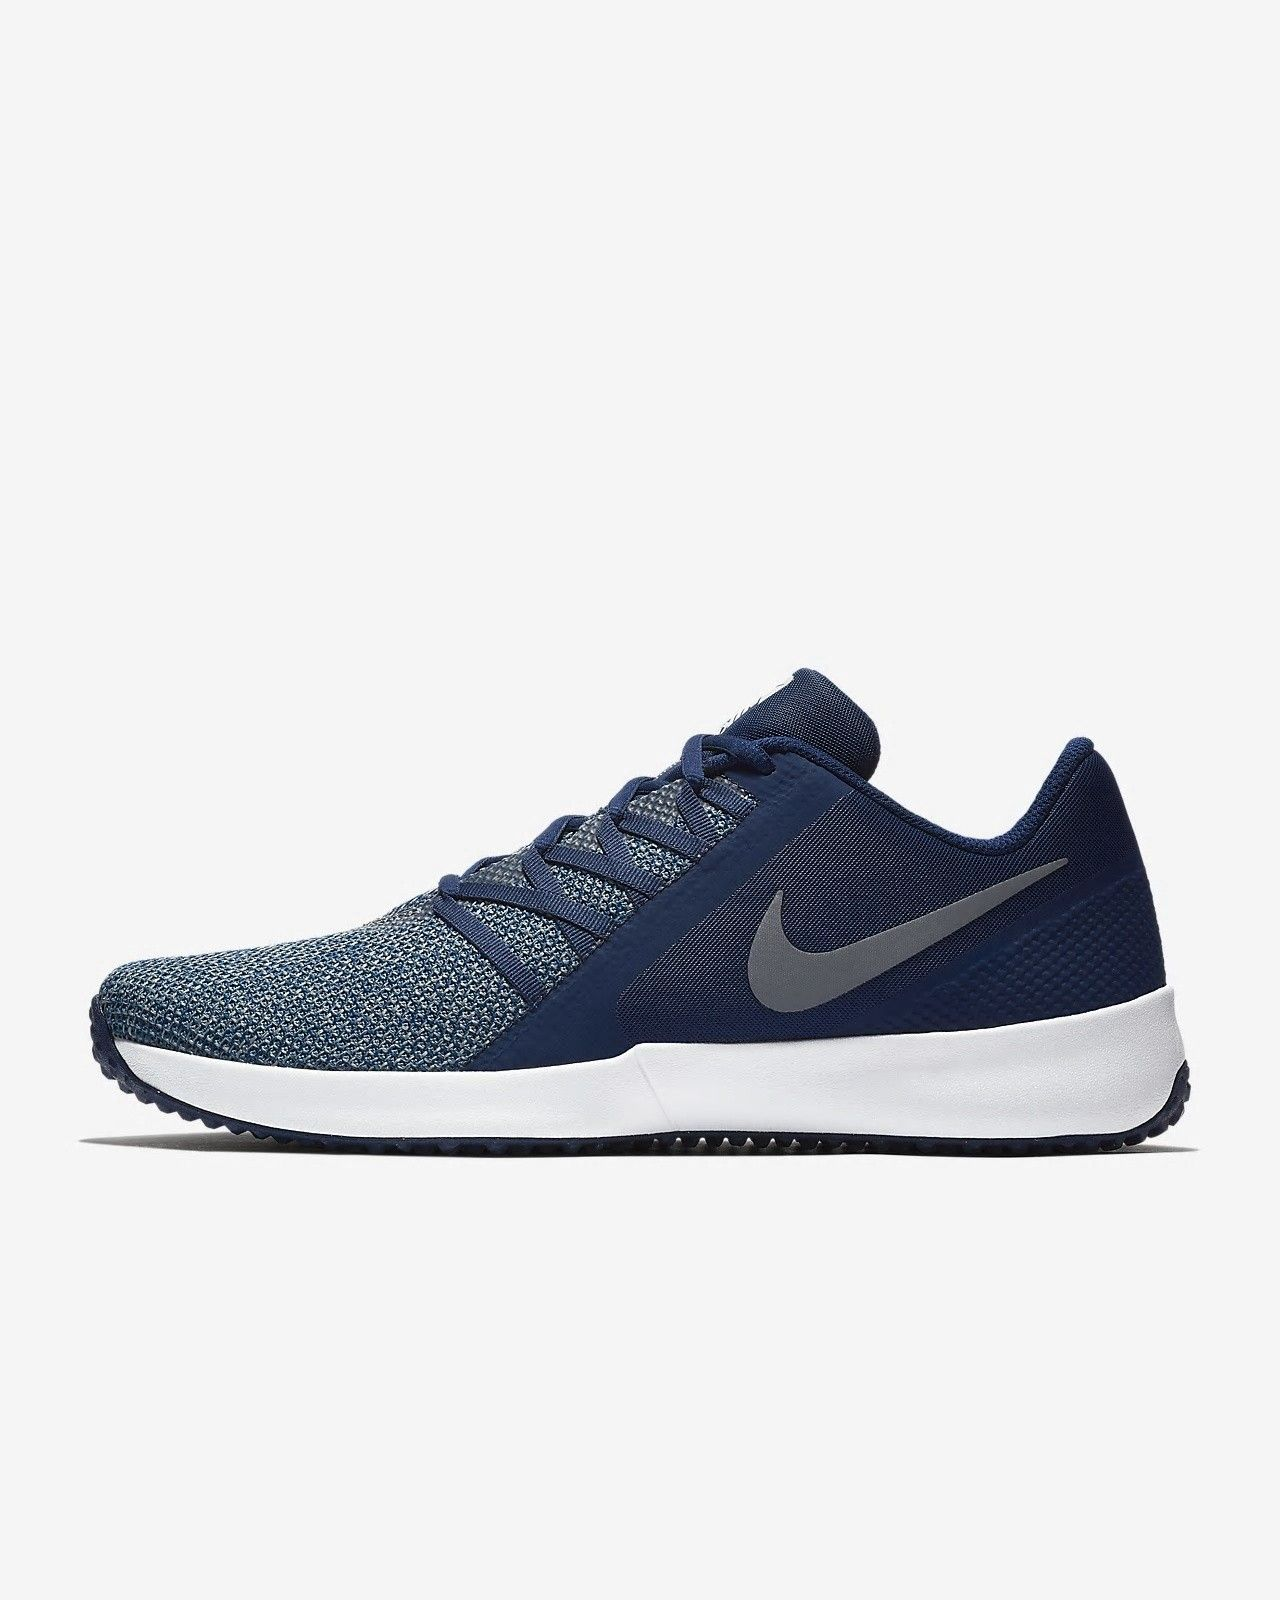 Nike Varsity Complete Trainer | Mens